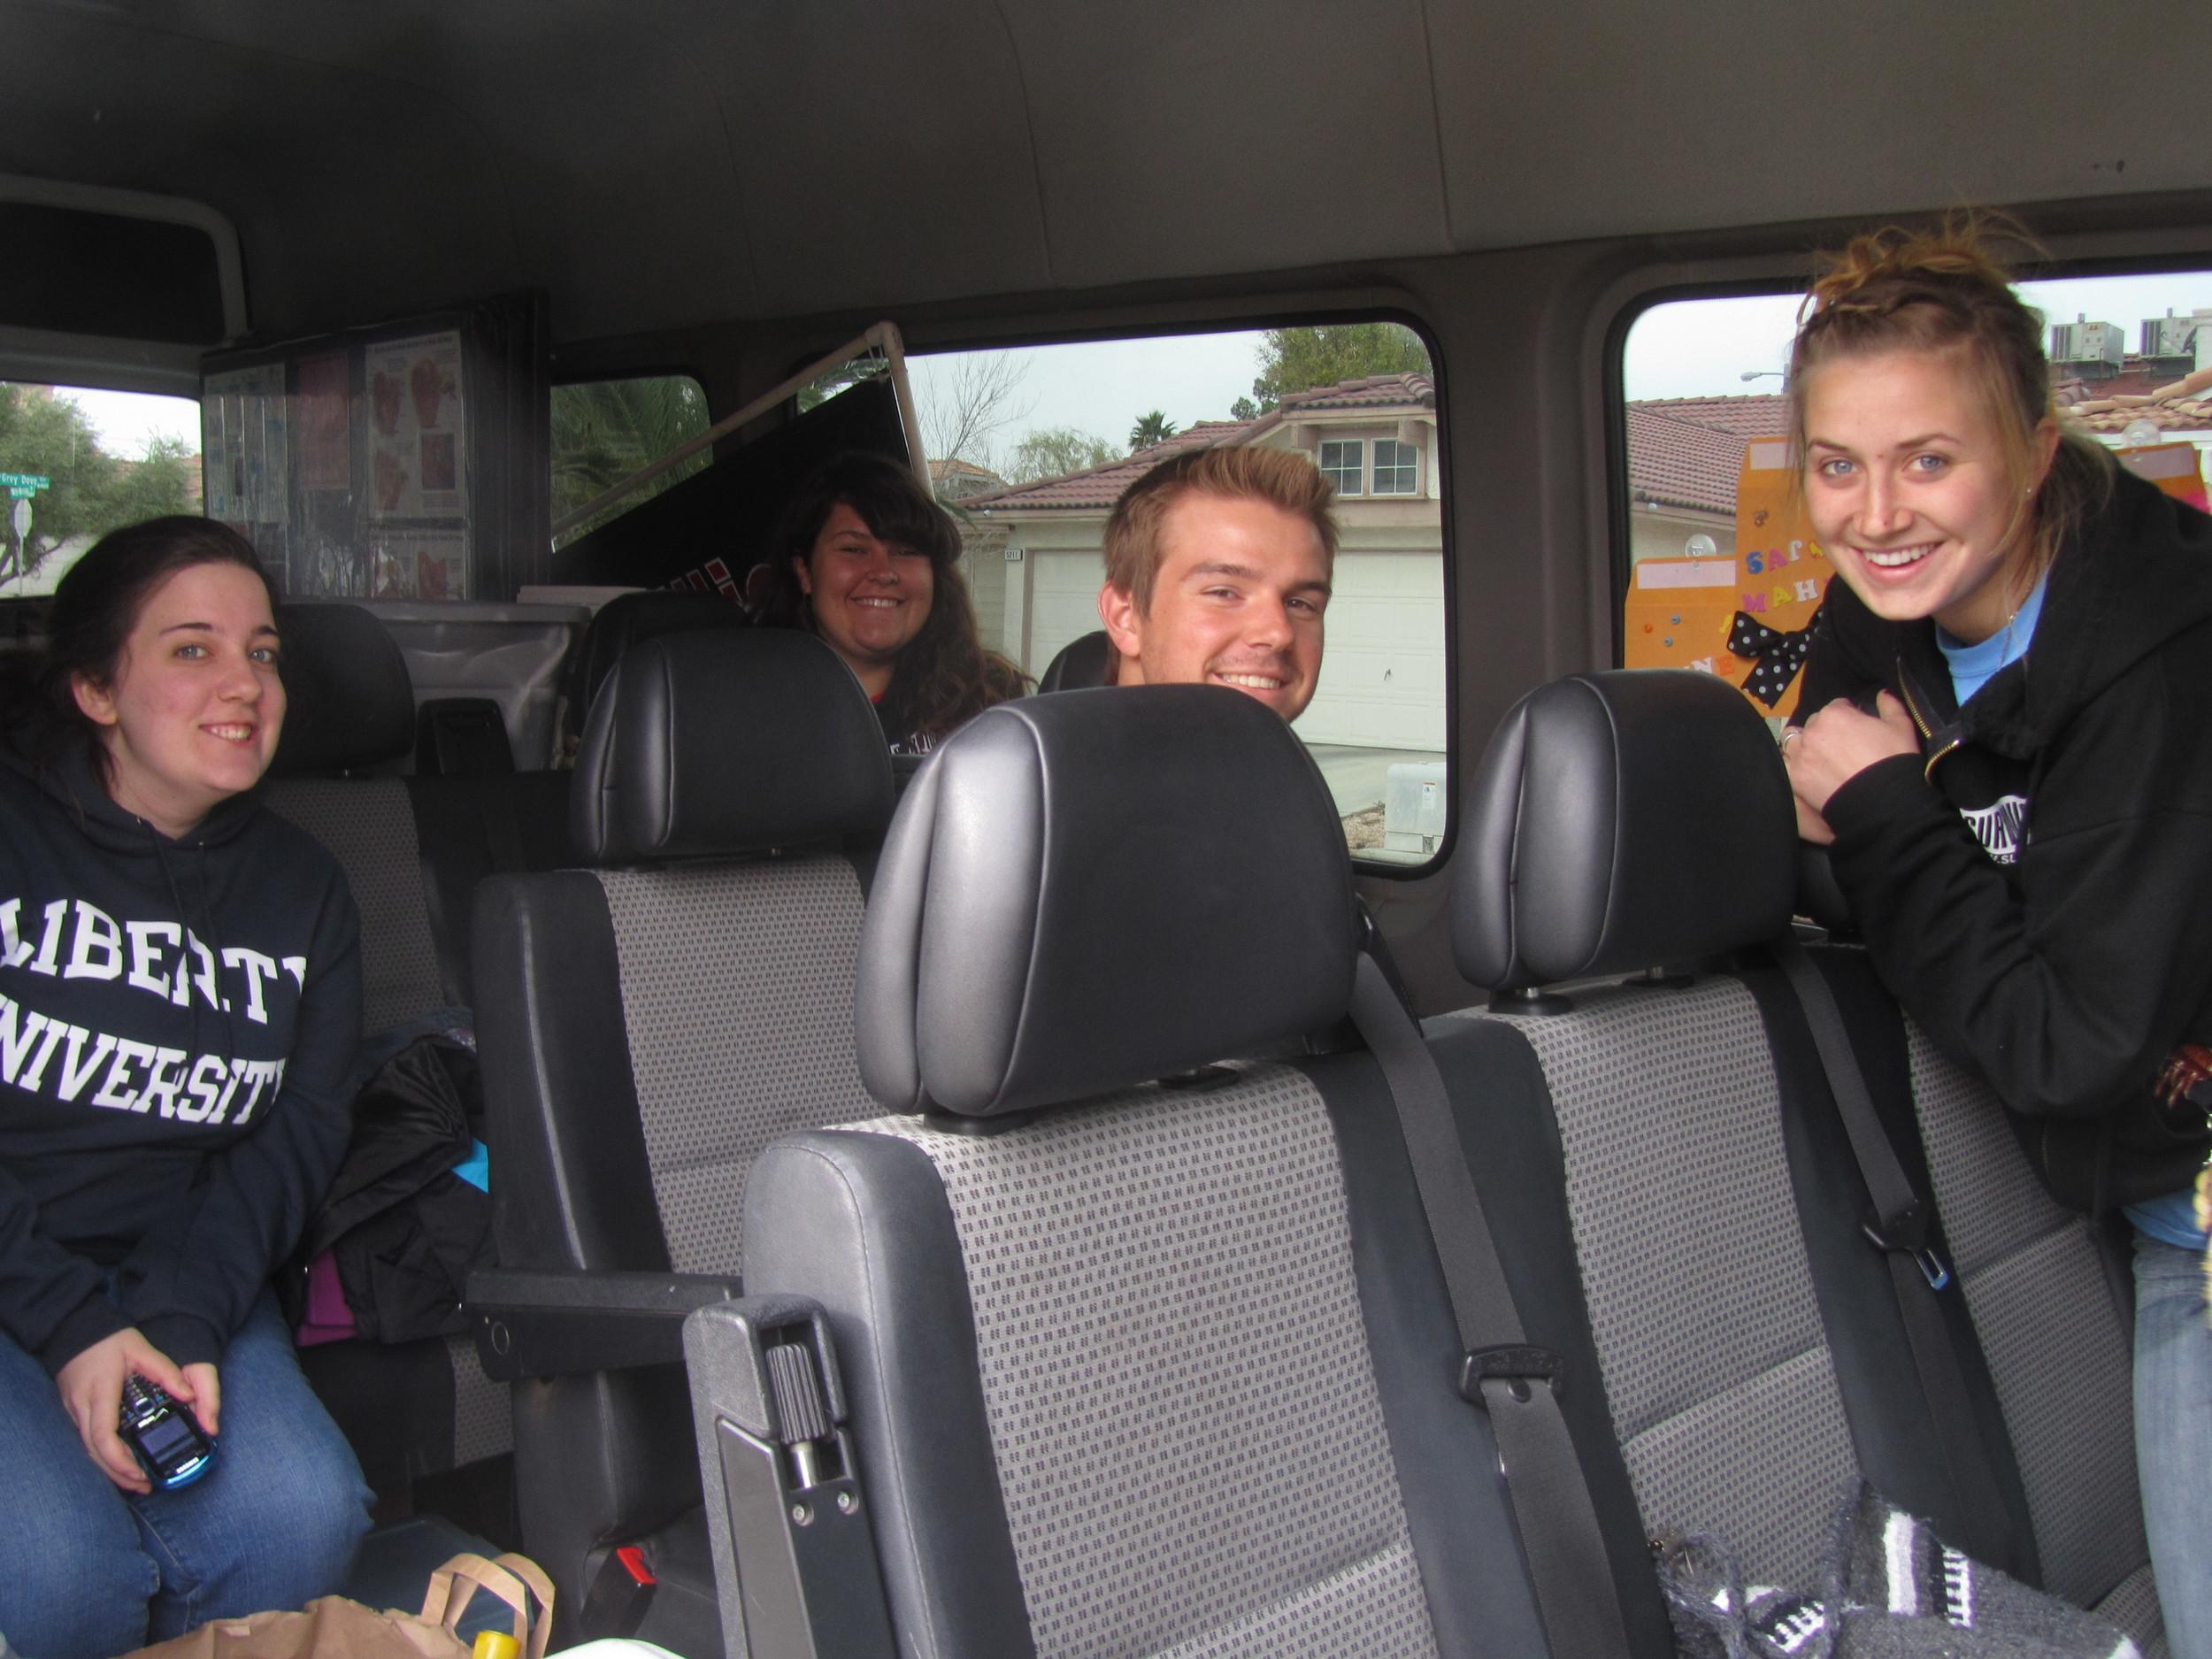 Inside the Sprinter, our baby-saving bus!